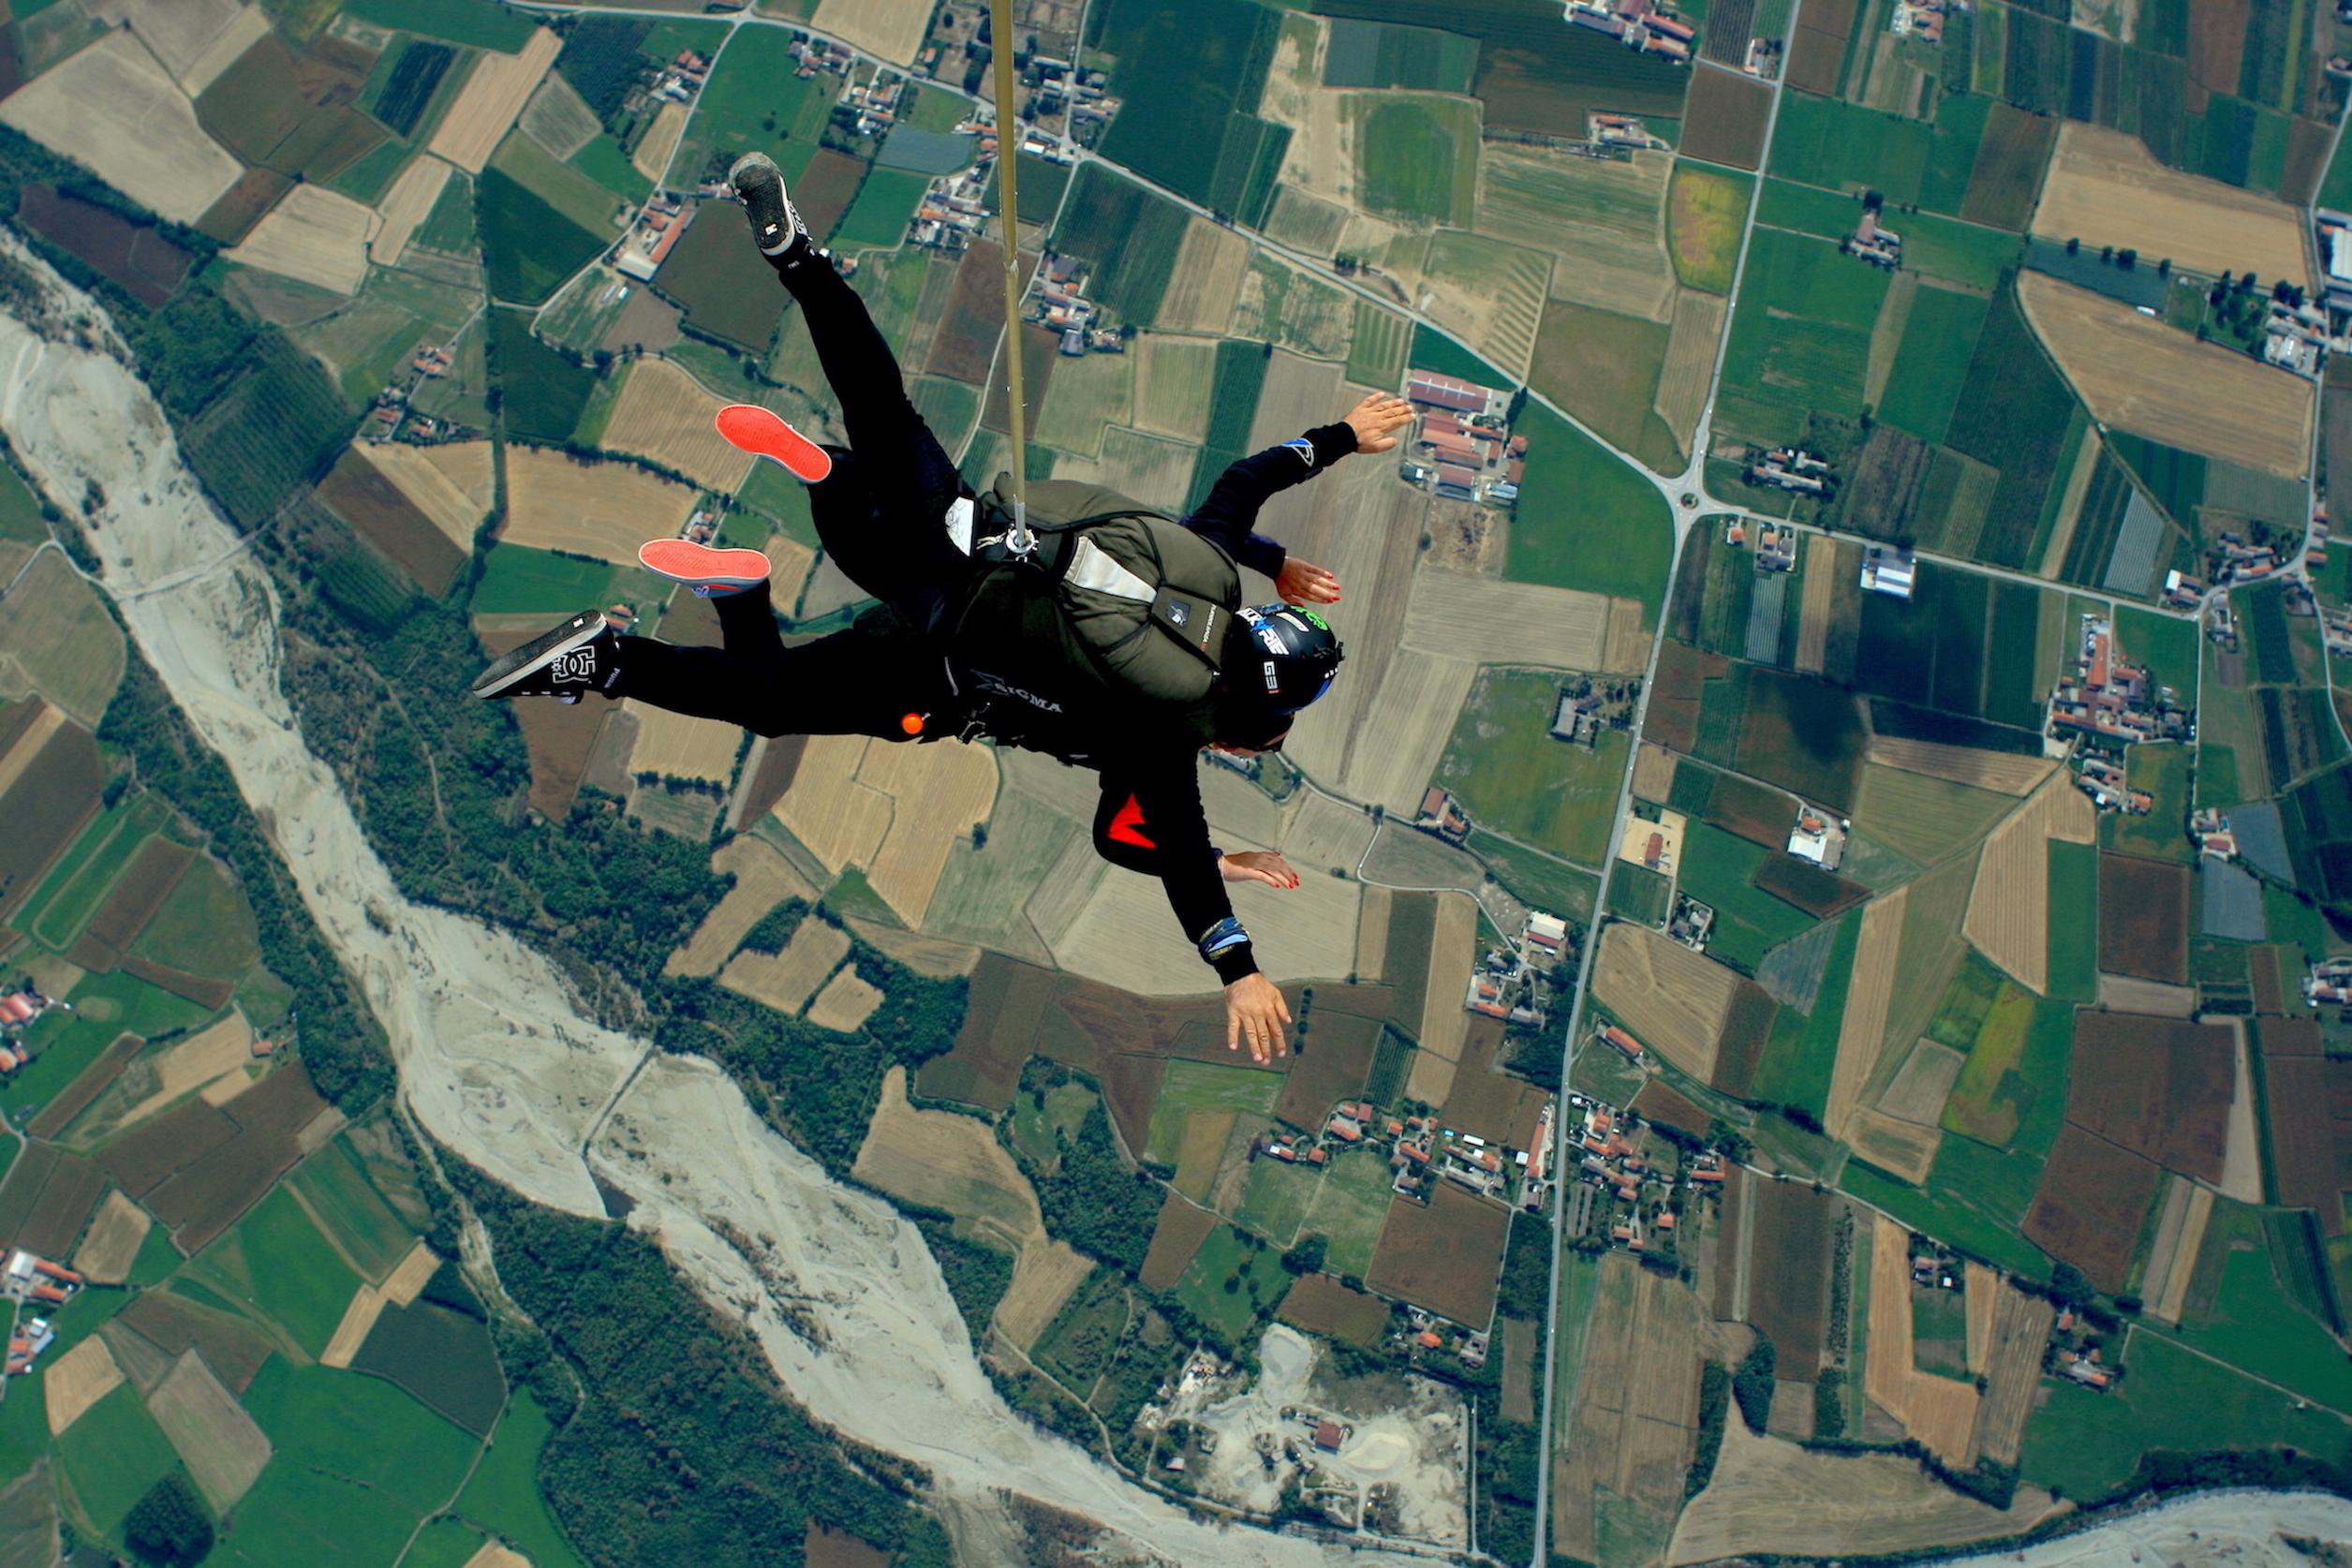 skydiving_lustforthesublime